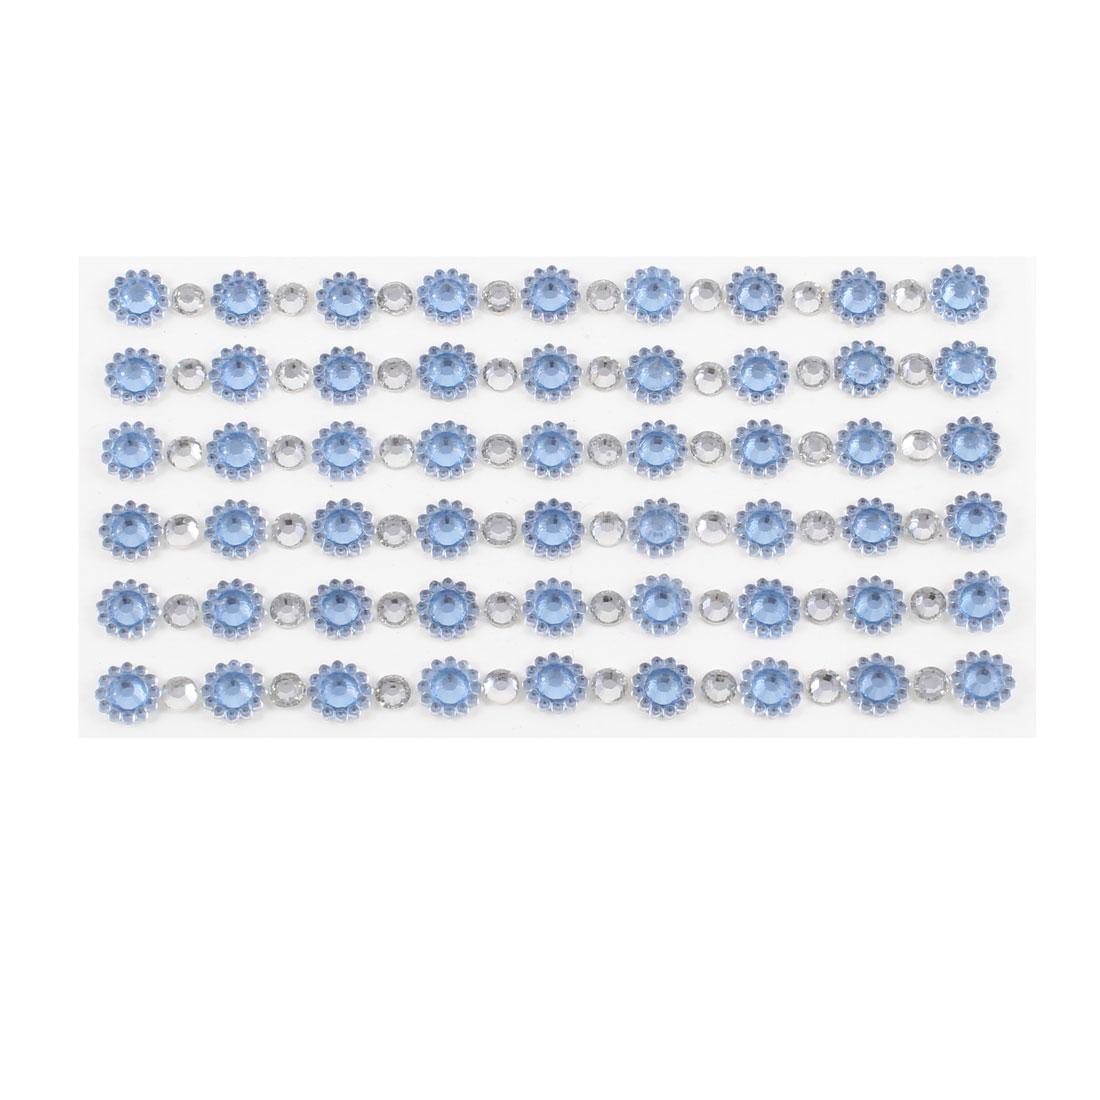 Light Blue Shiny Rhinestones Floral Auto Car Phone Sticker Decoration 6 in 1